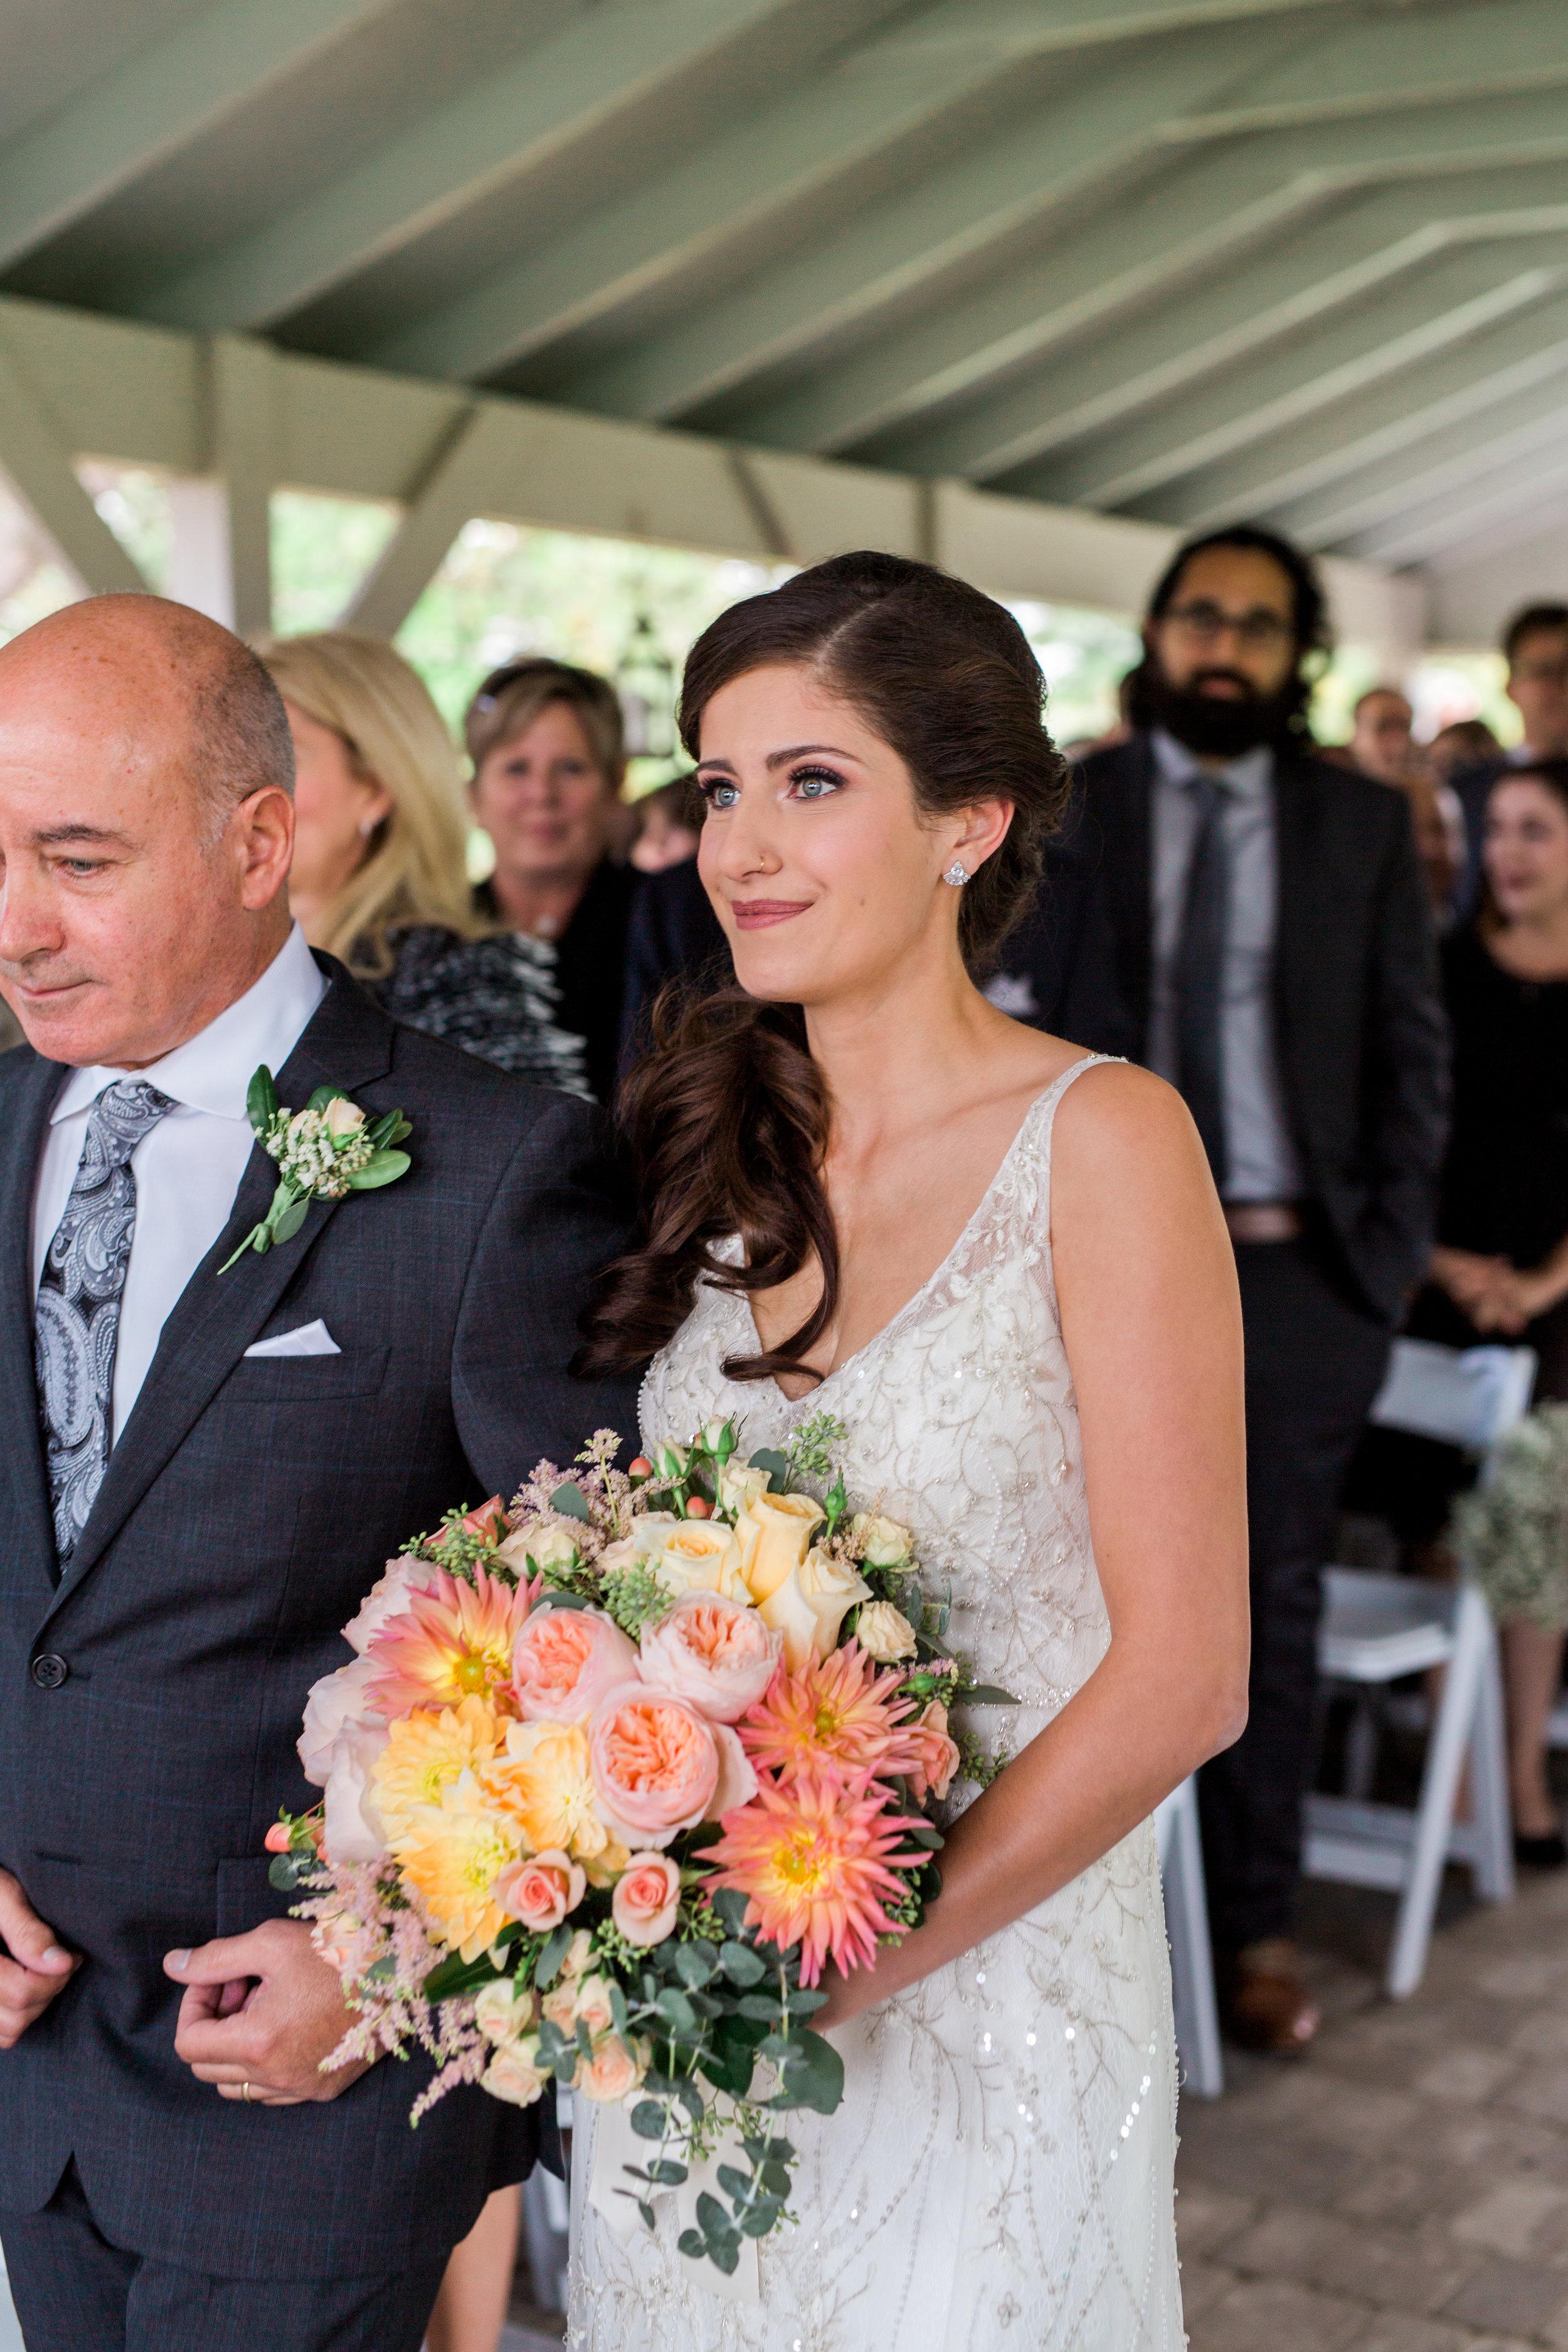 Amir-Golbazi-Danielle-Giroux-Photography_Toronto-Wedding_Cedarwood_Rachel-Paul_170.jpg